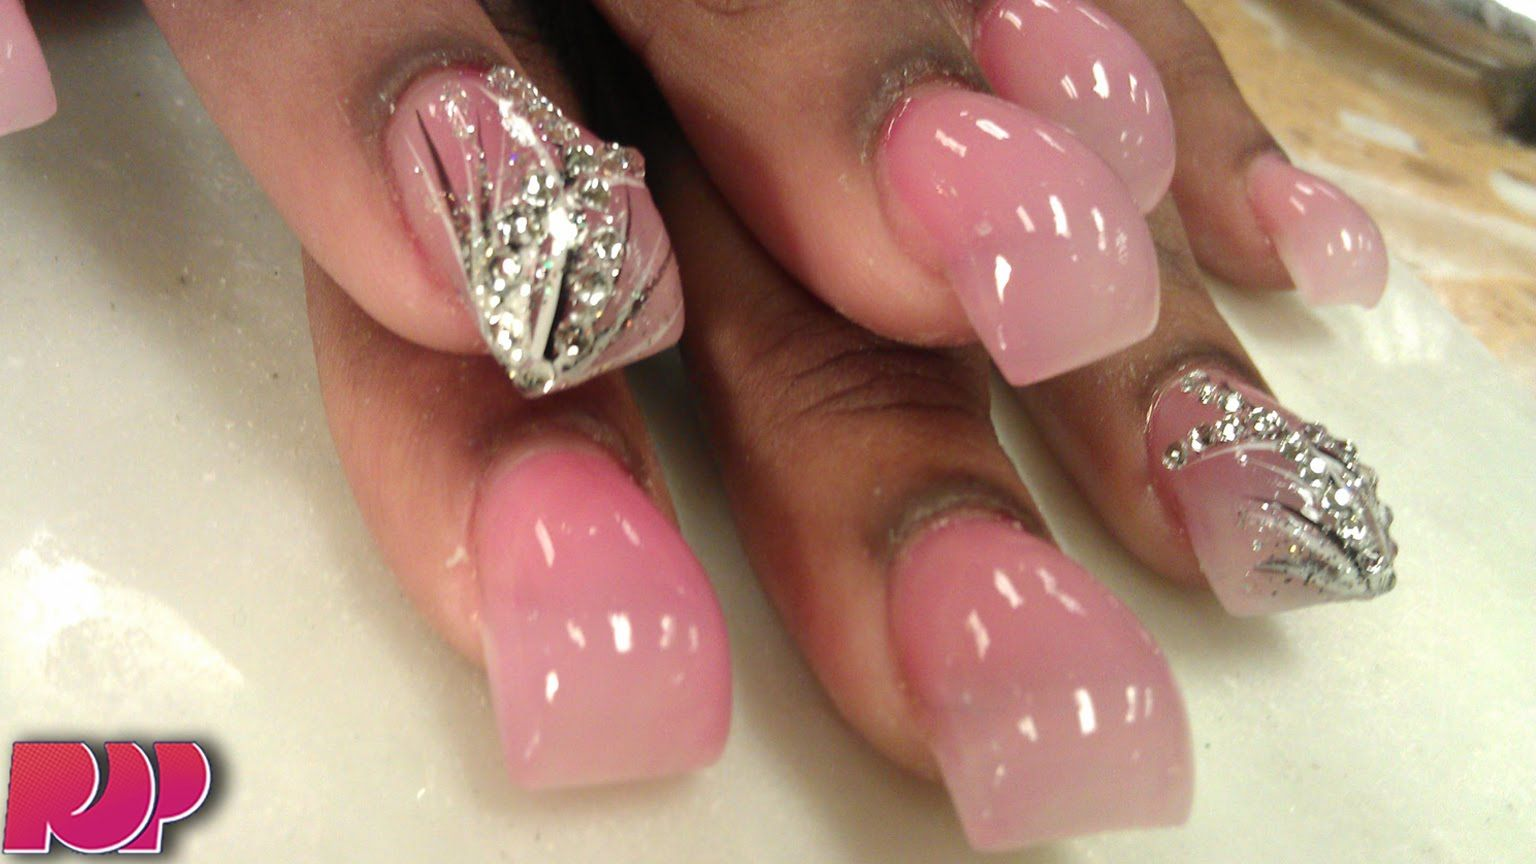 bubble nails - alternative, extreme nail designs - Bubble Nails - Alternative, Extreme Nail Designs Curved Nails